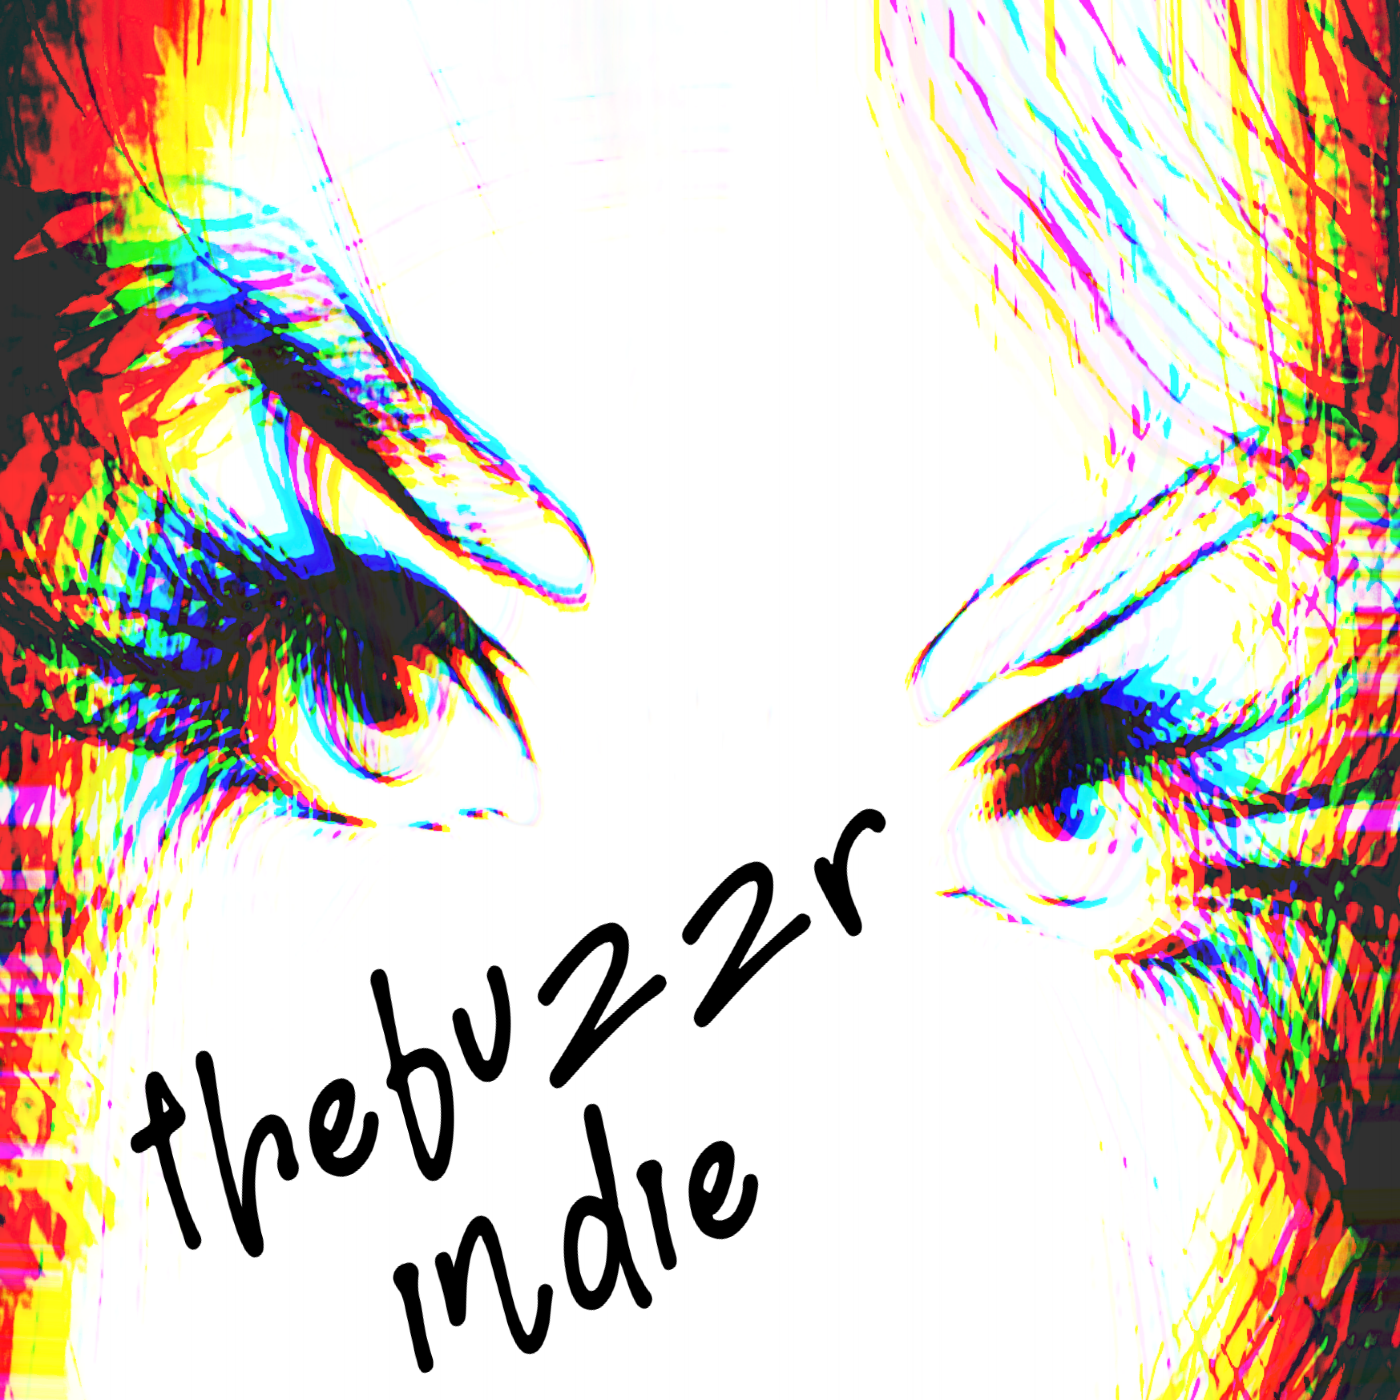 thebuzzr pod